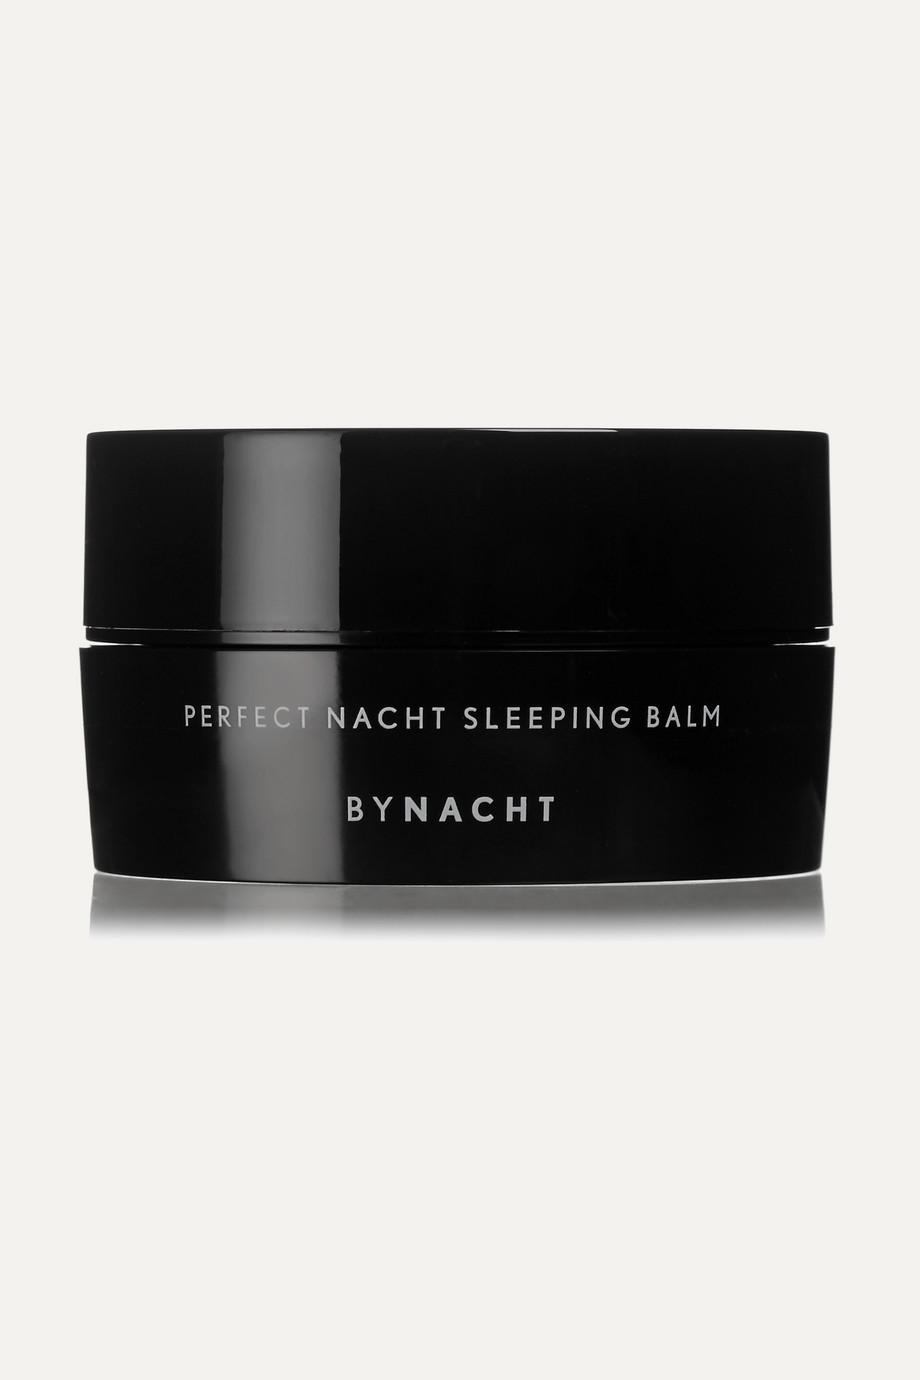 BYNACHT Perfect Nacht Sleeping Balm, 15ml